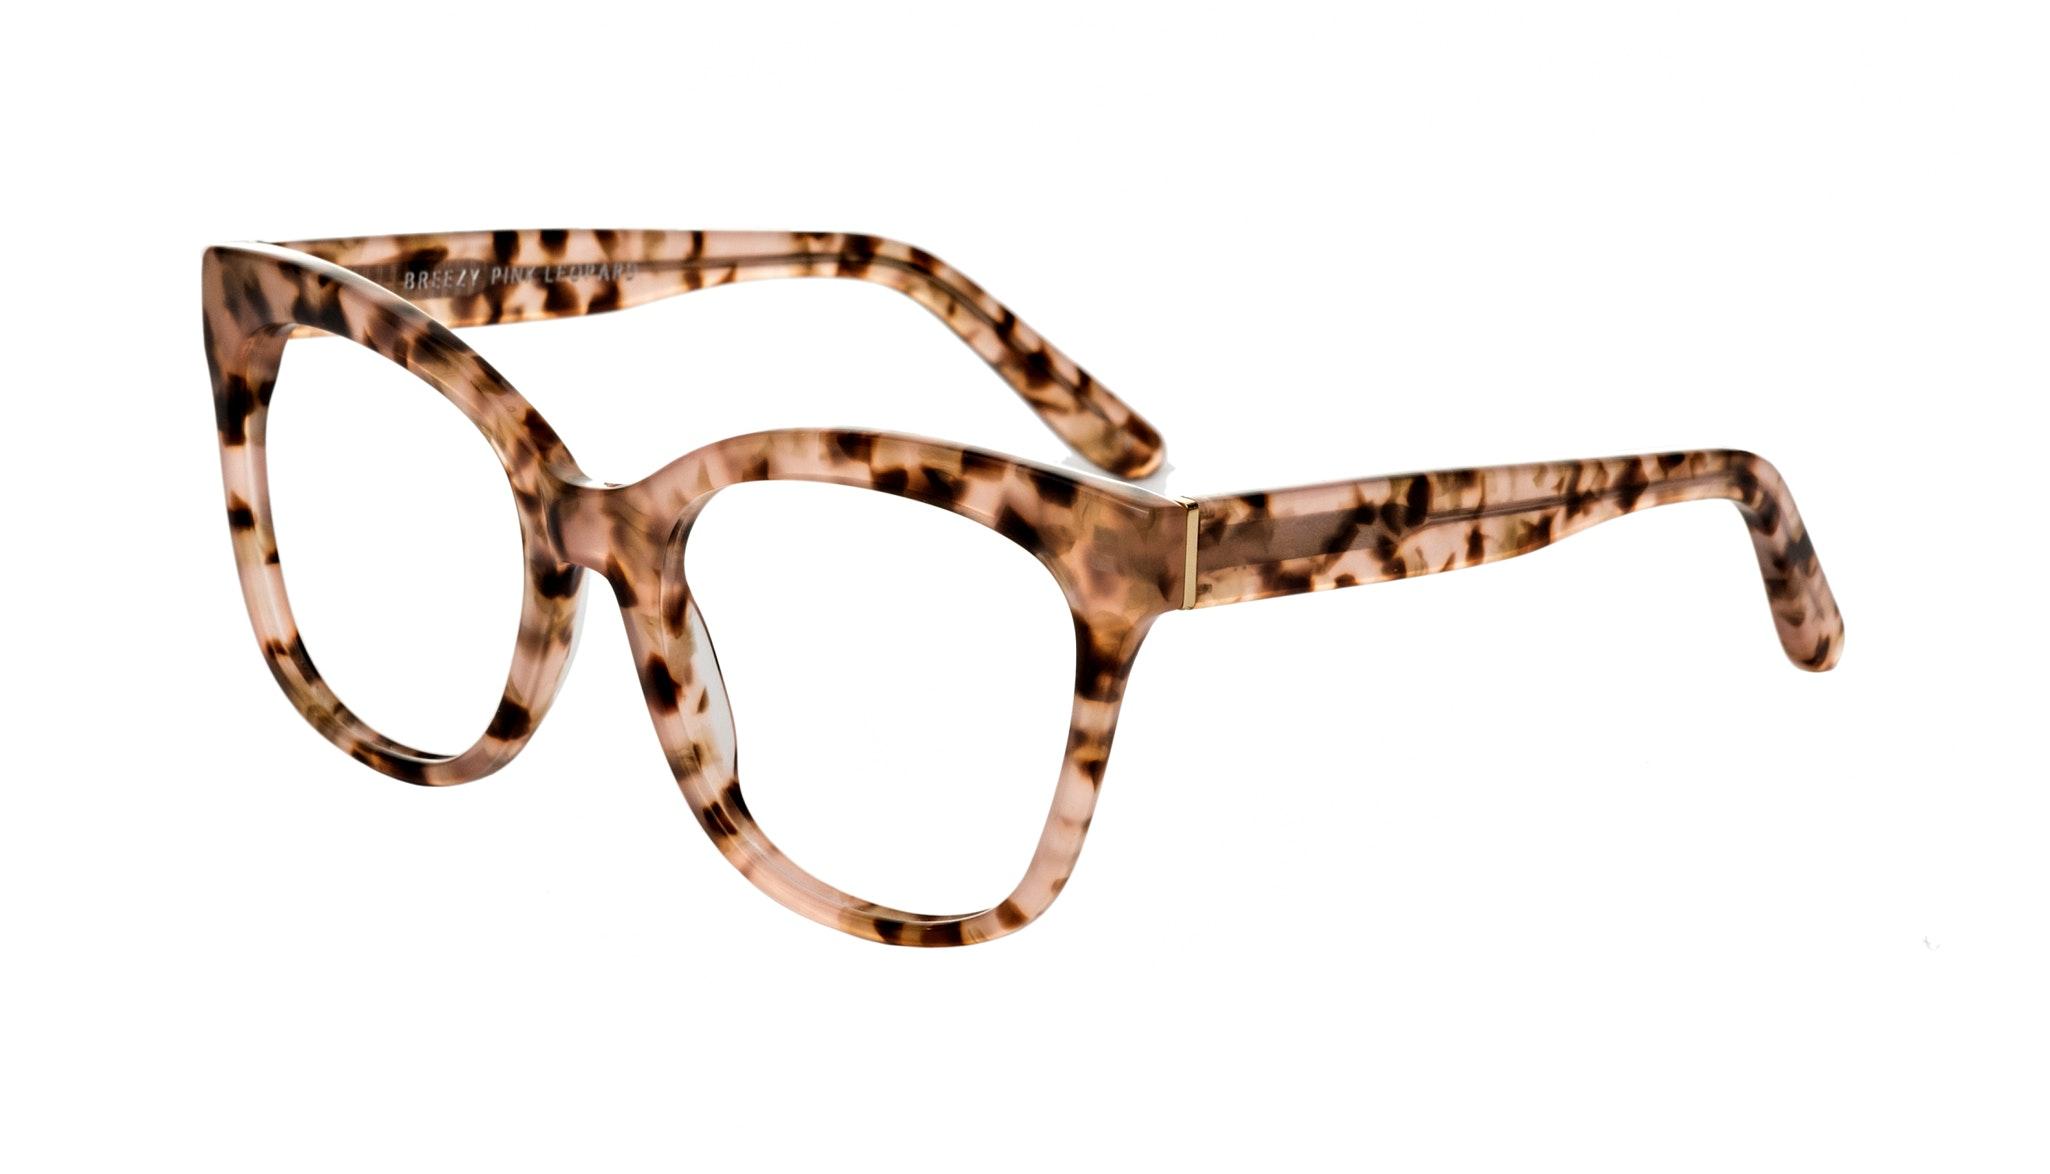 Affordable Fashion Glasses Rectangle Square Eyeglasses Women Breezy Pink Leopard Tilt